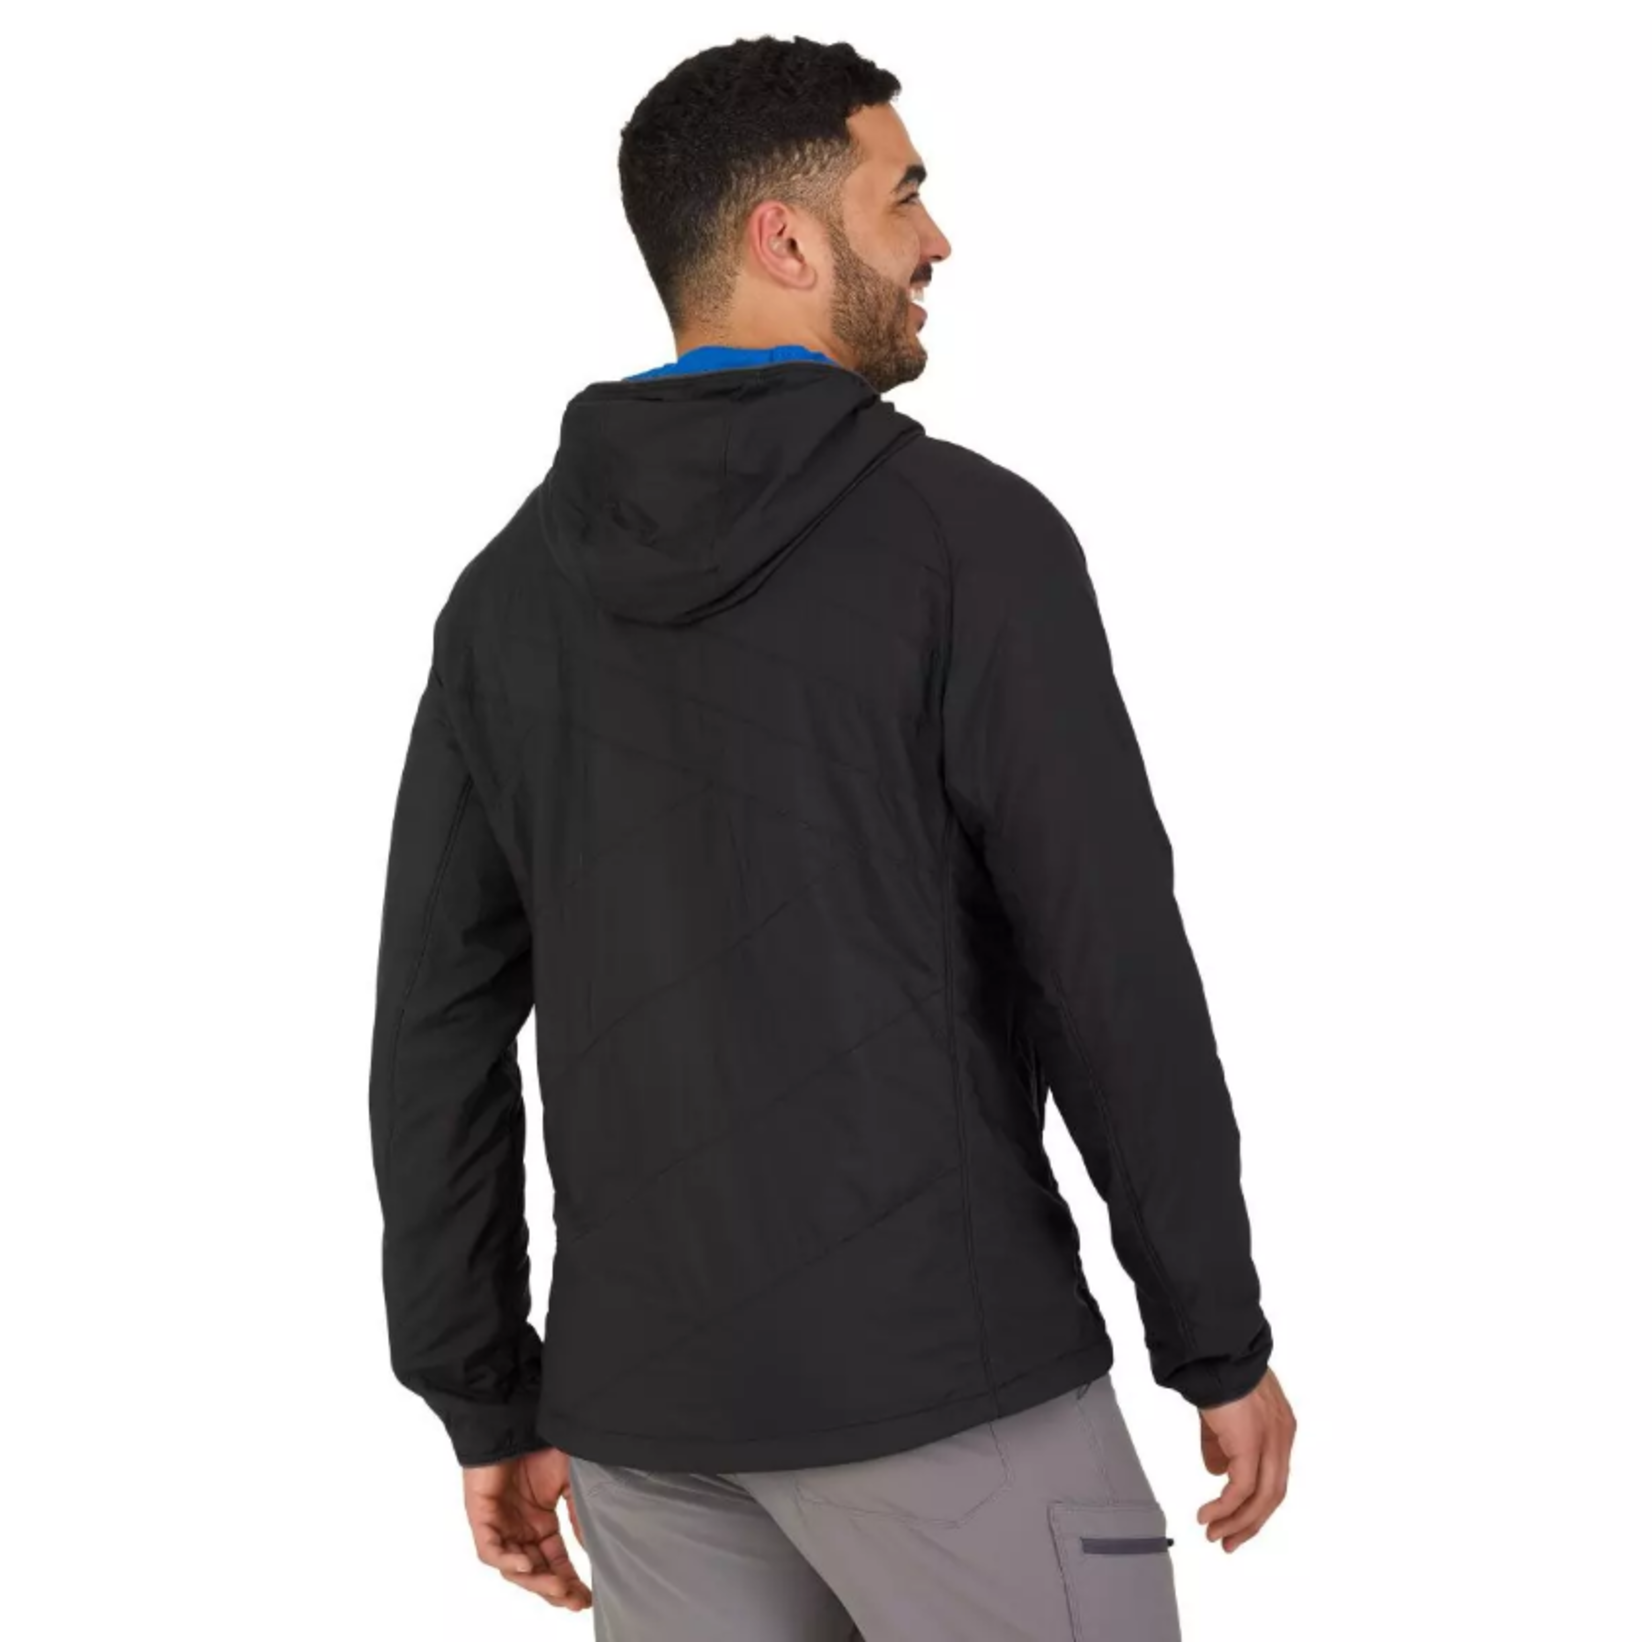 OR Outdoor Research Men's Refuge Jacket